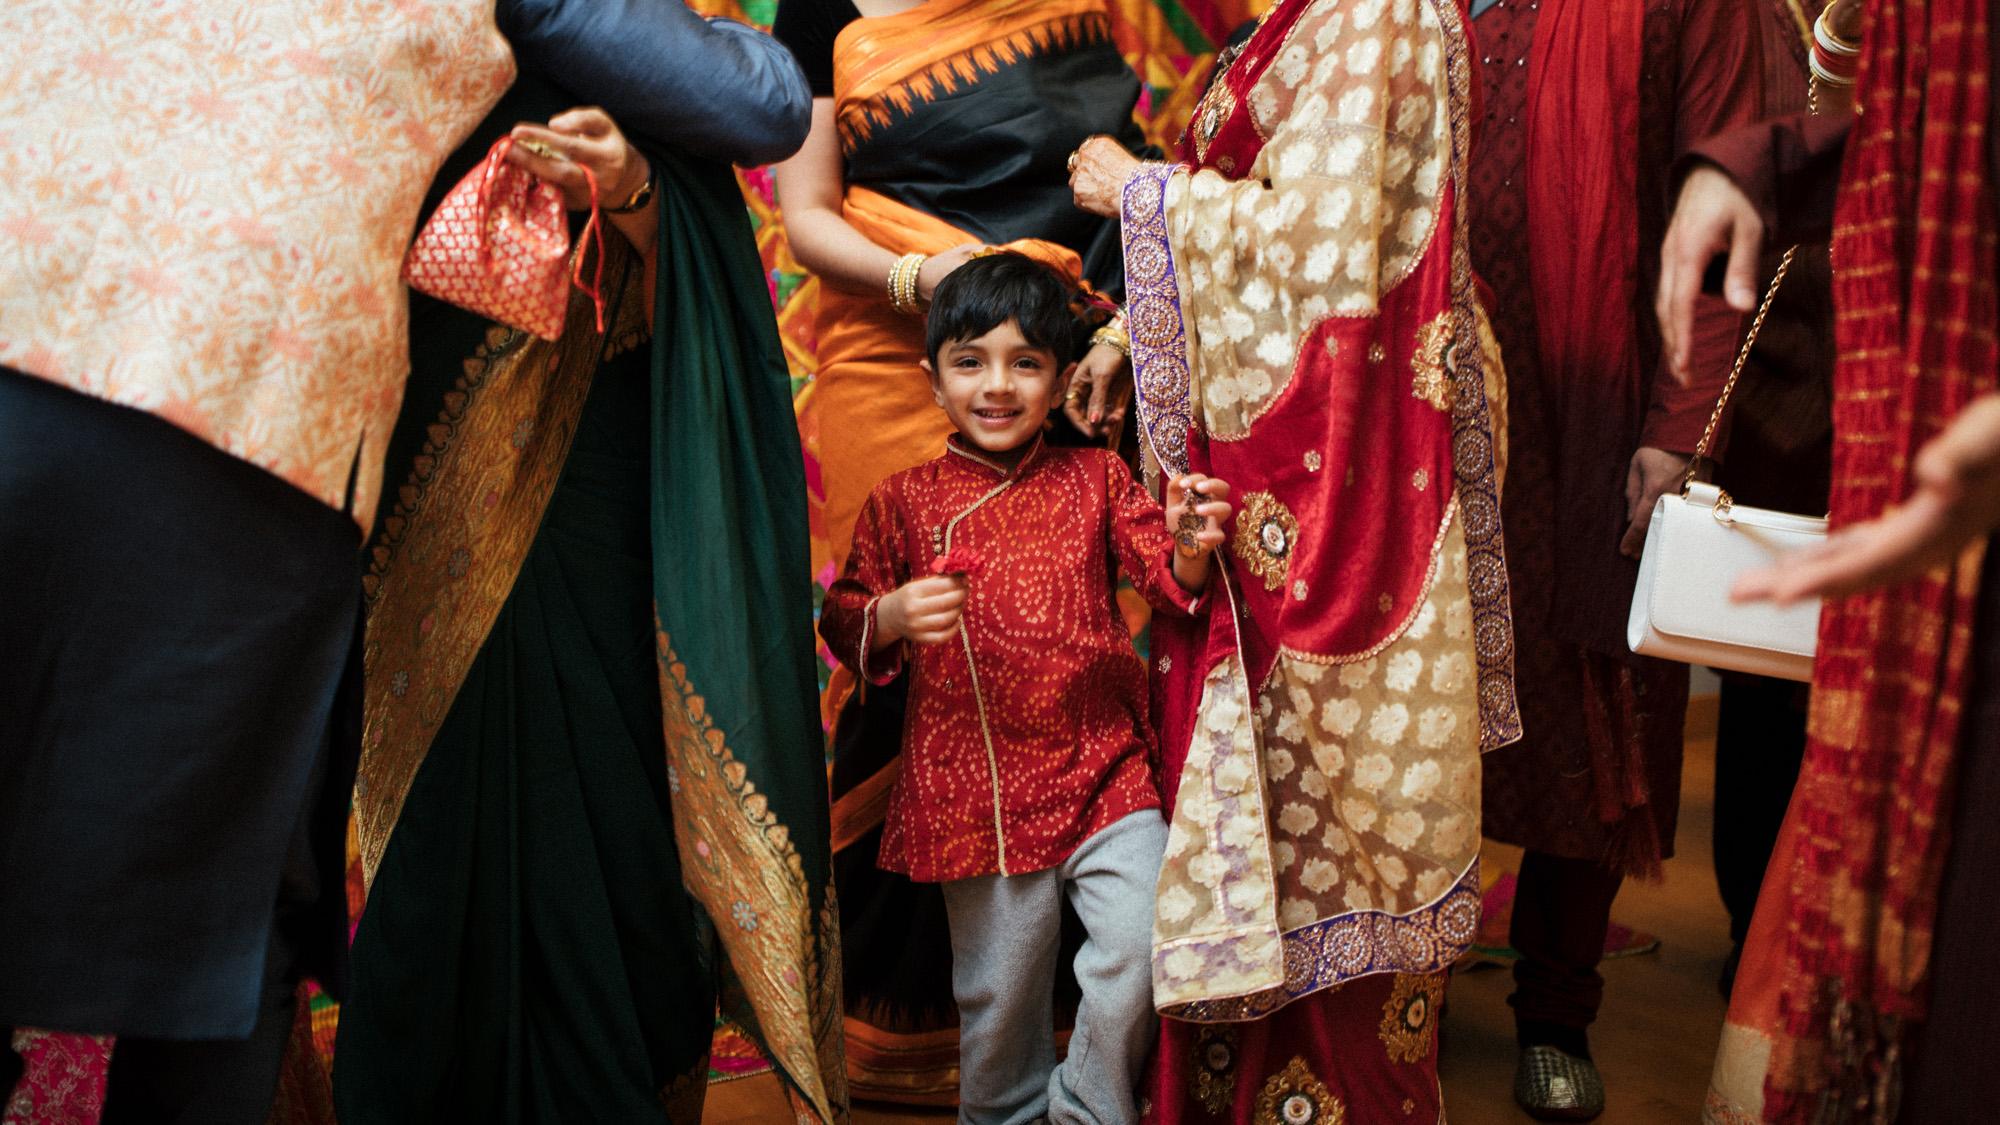 anu_maneesh_alec_vanderboom_Indian_wedding_photography-0039.jpg